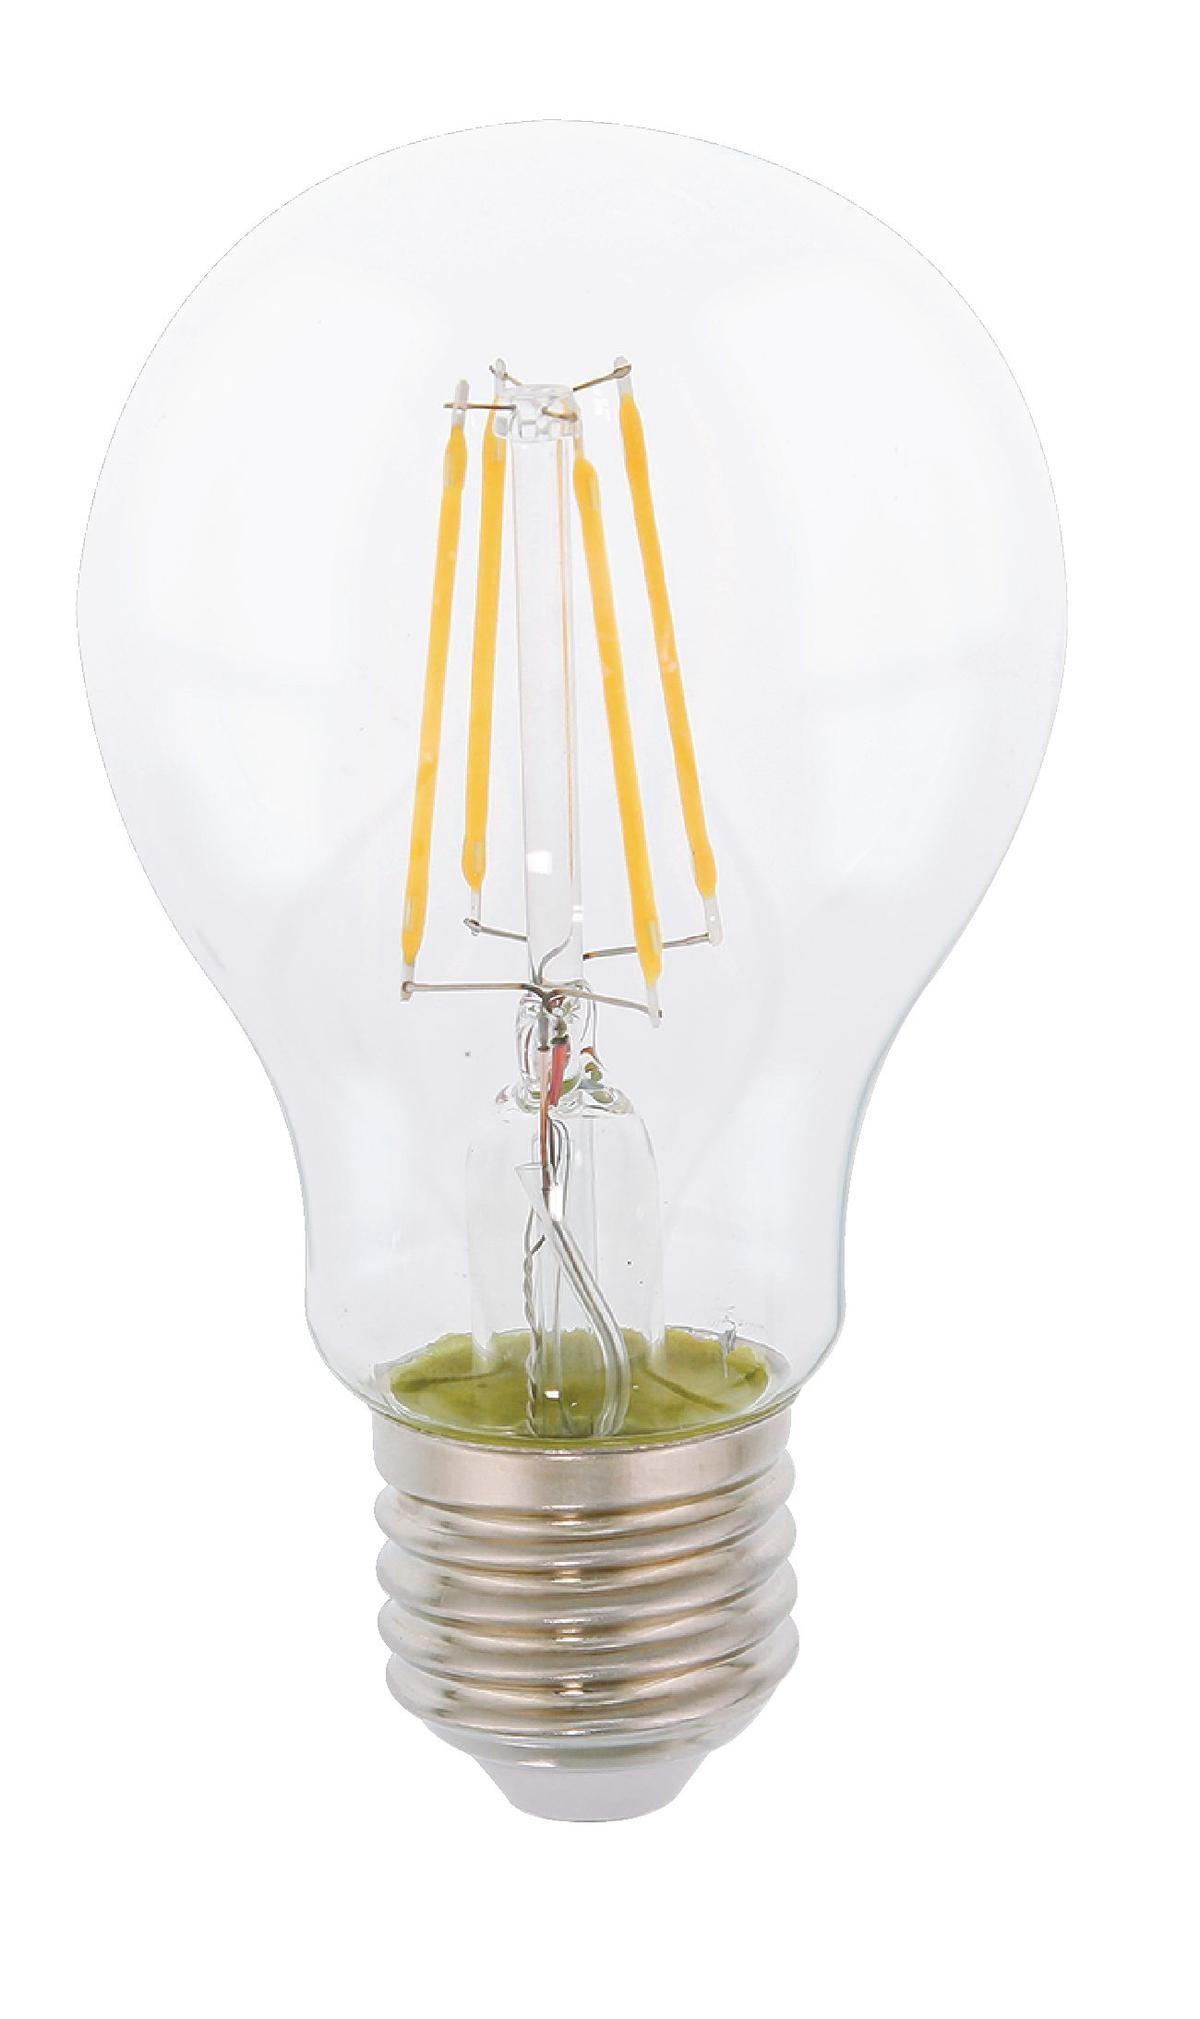 retro led filamentlamp e27 a60 7 w 806 lm 2700 k hqlfe27a60002 rutten elektroshop. Black Bedroom Furniture Sets. Home Design Ideas